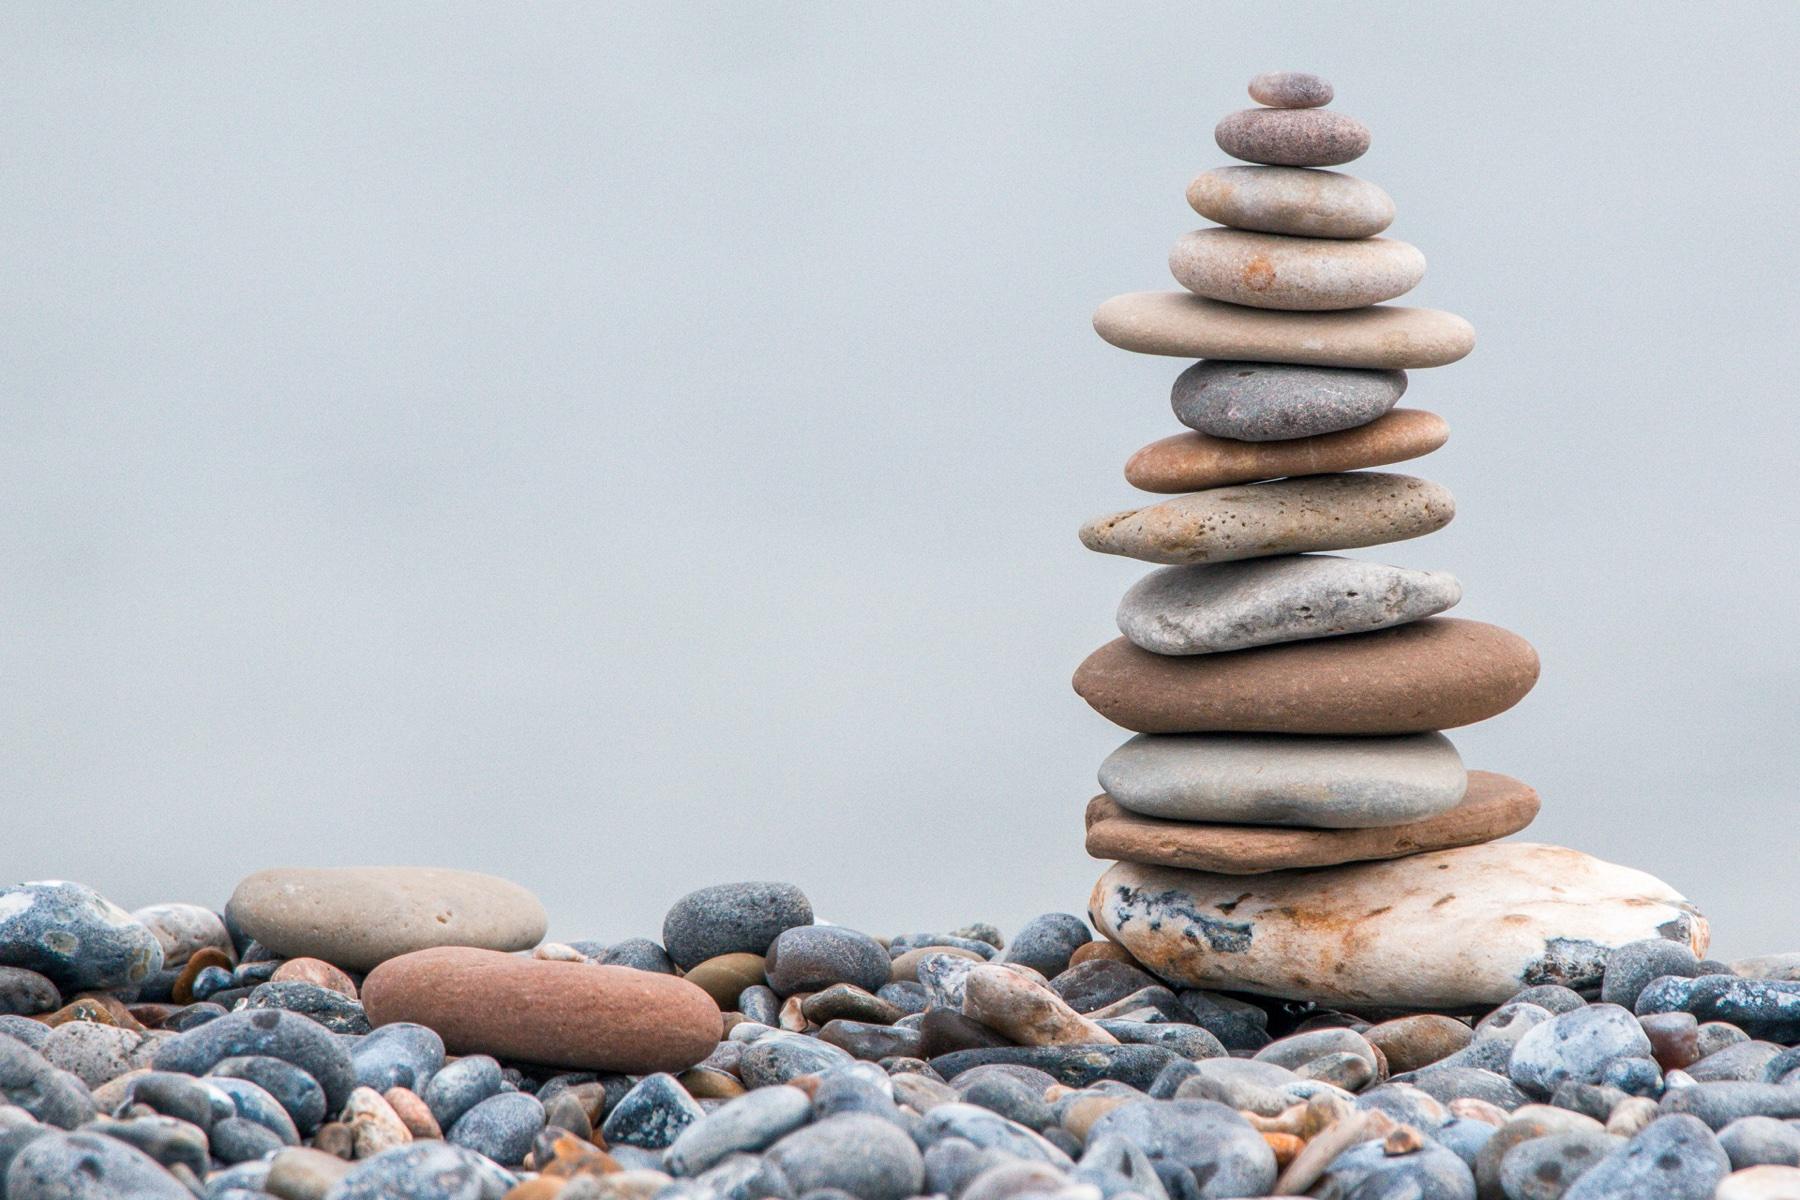 stone-tower-3280616